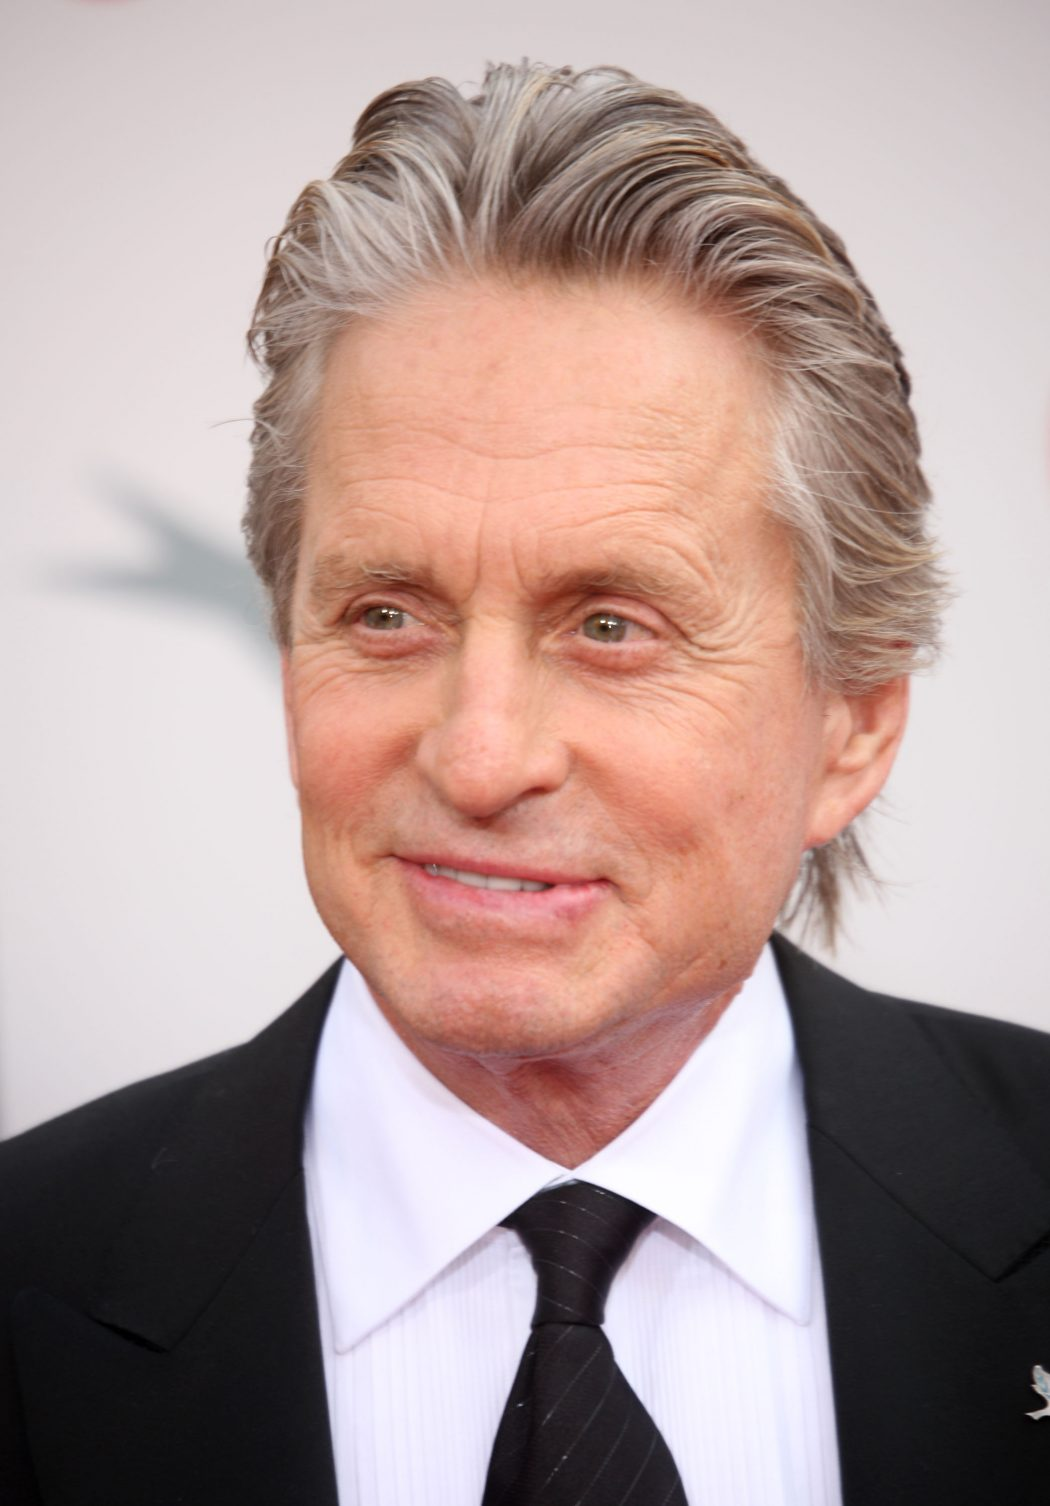 Michael-Douglas-michael-douglas-32936567-2092-3000 12 of The Most Attractive Actors Over 60